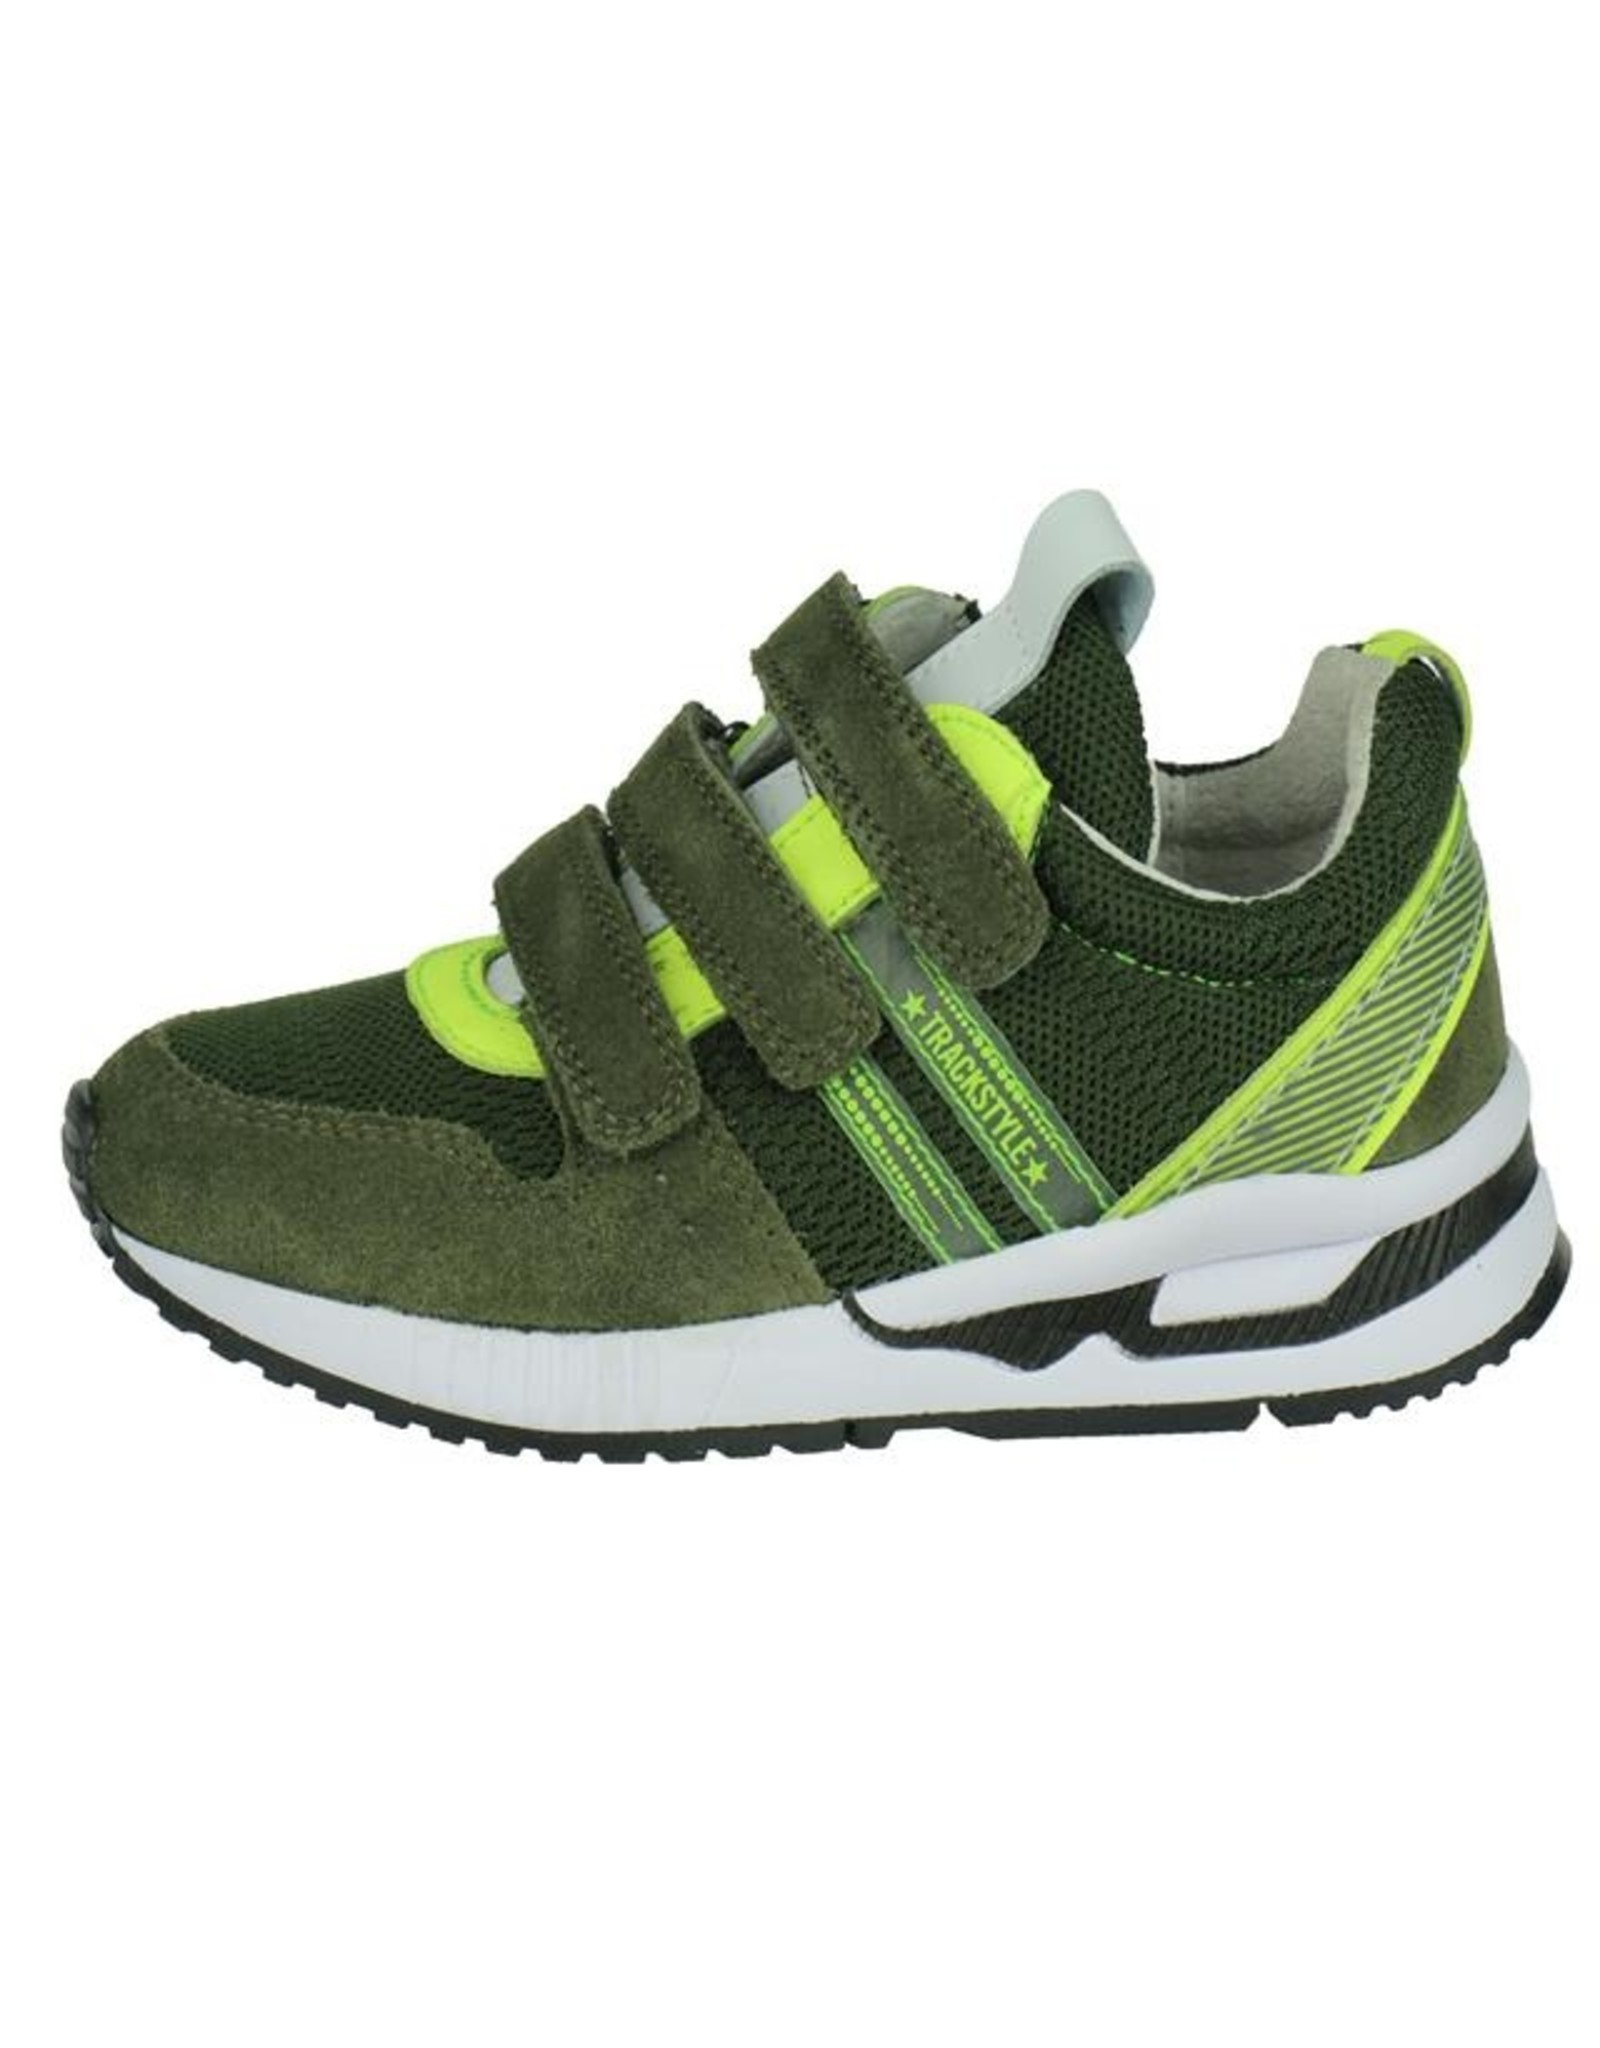 Track - Style Track - Style - Klittenband Jongens Sneaker